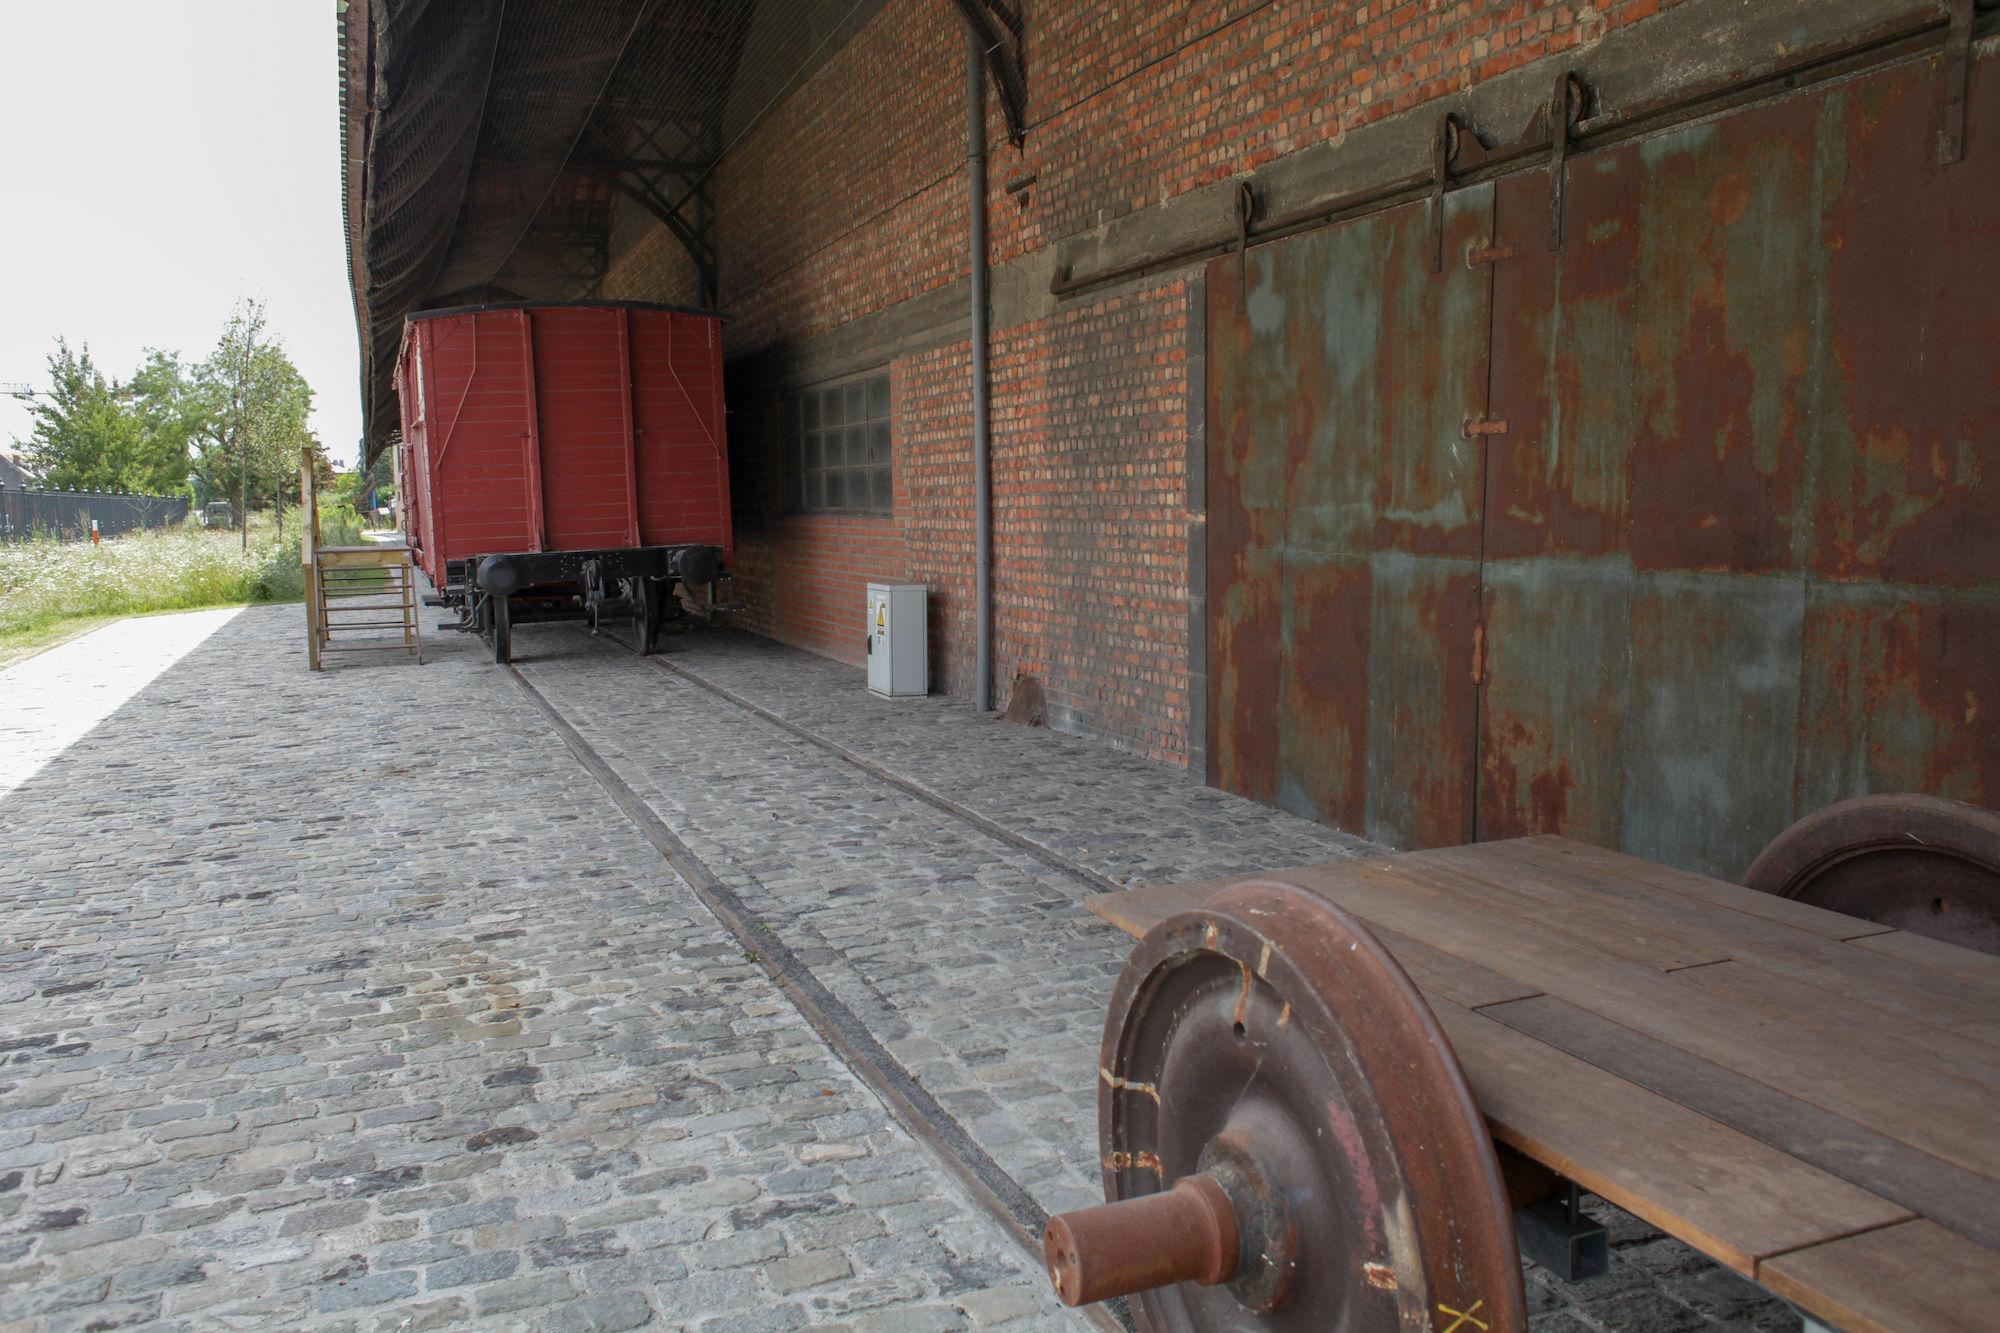 2019-07-02 Muide Meulestede prospectie Wannes_stadsvernieuwing_IMG_0396-2.jpg